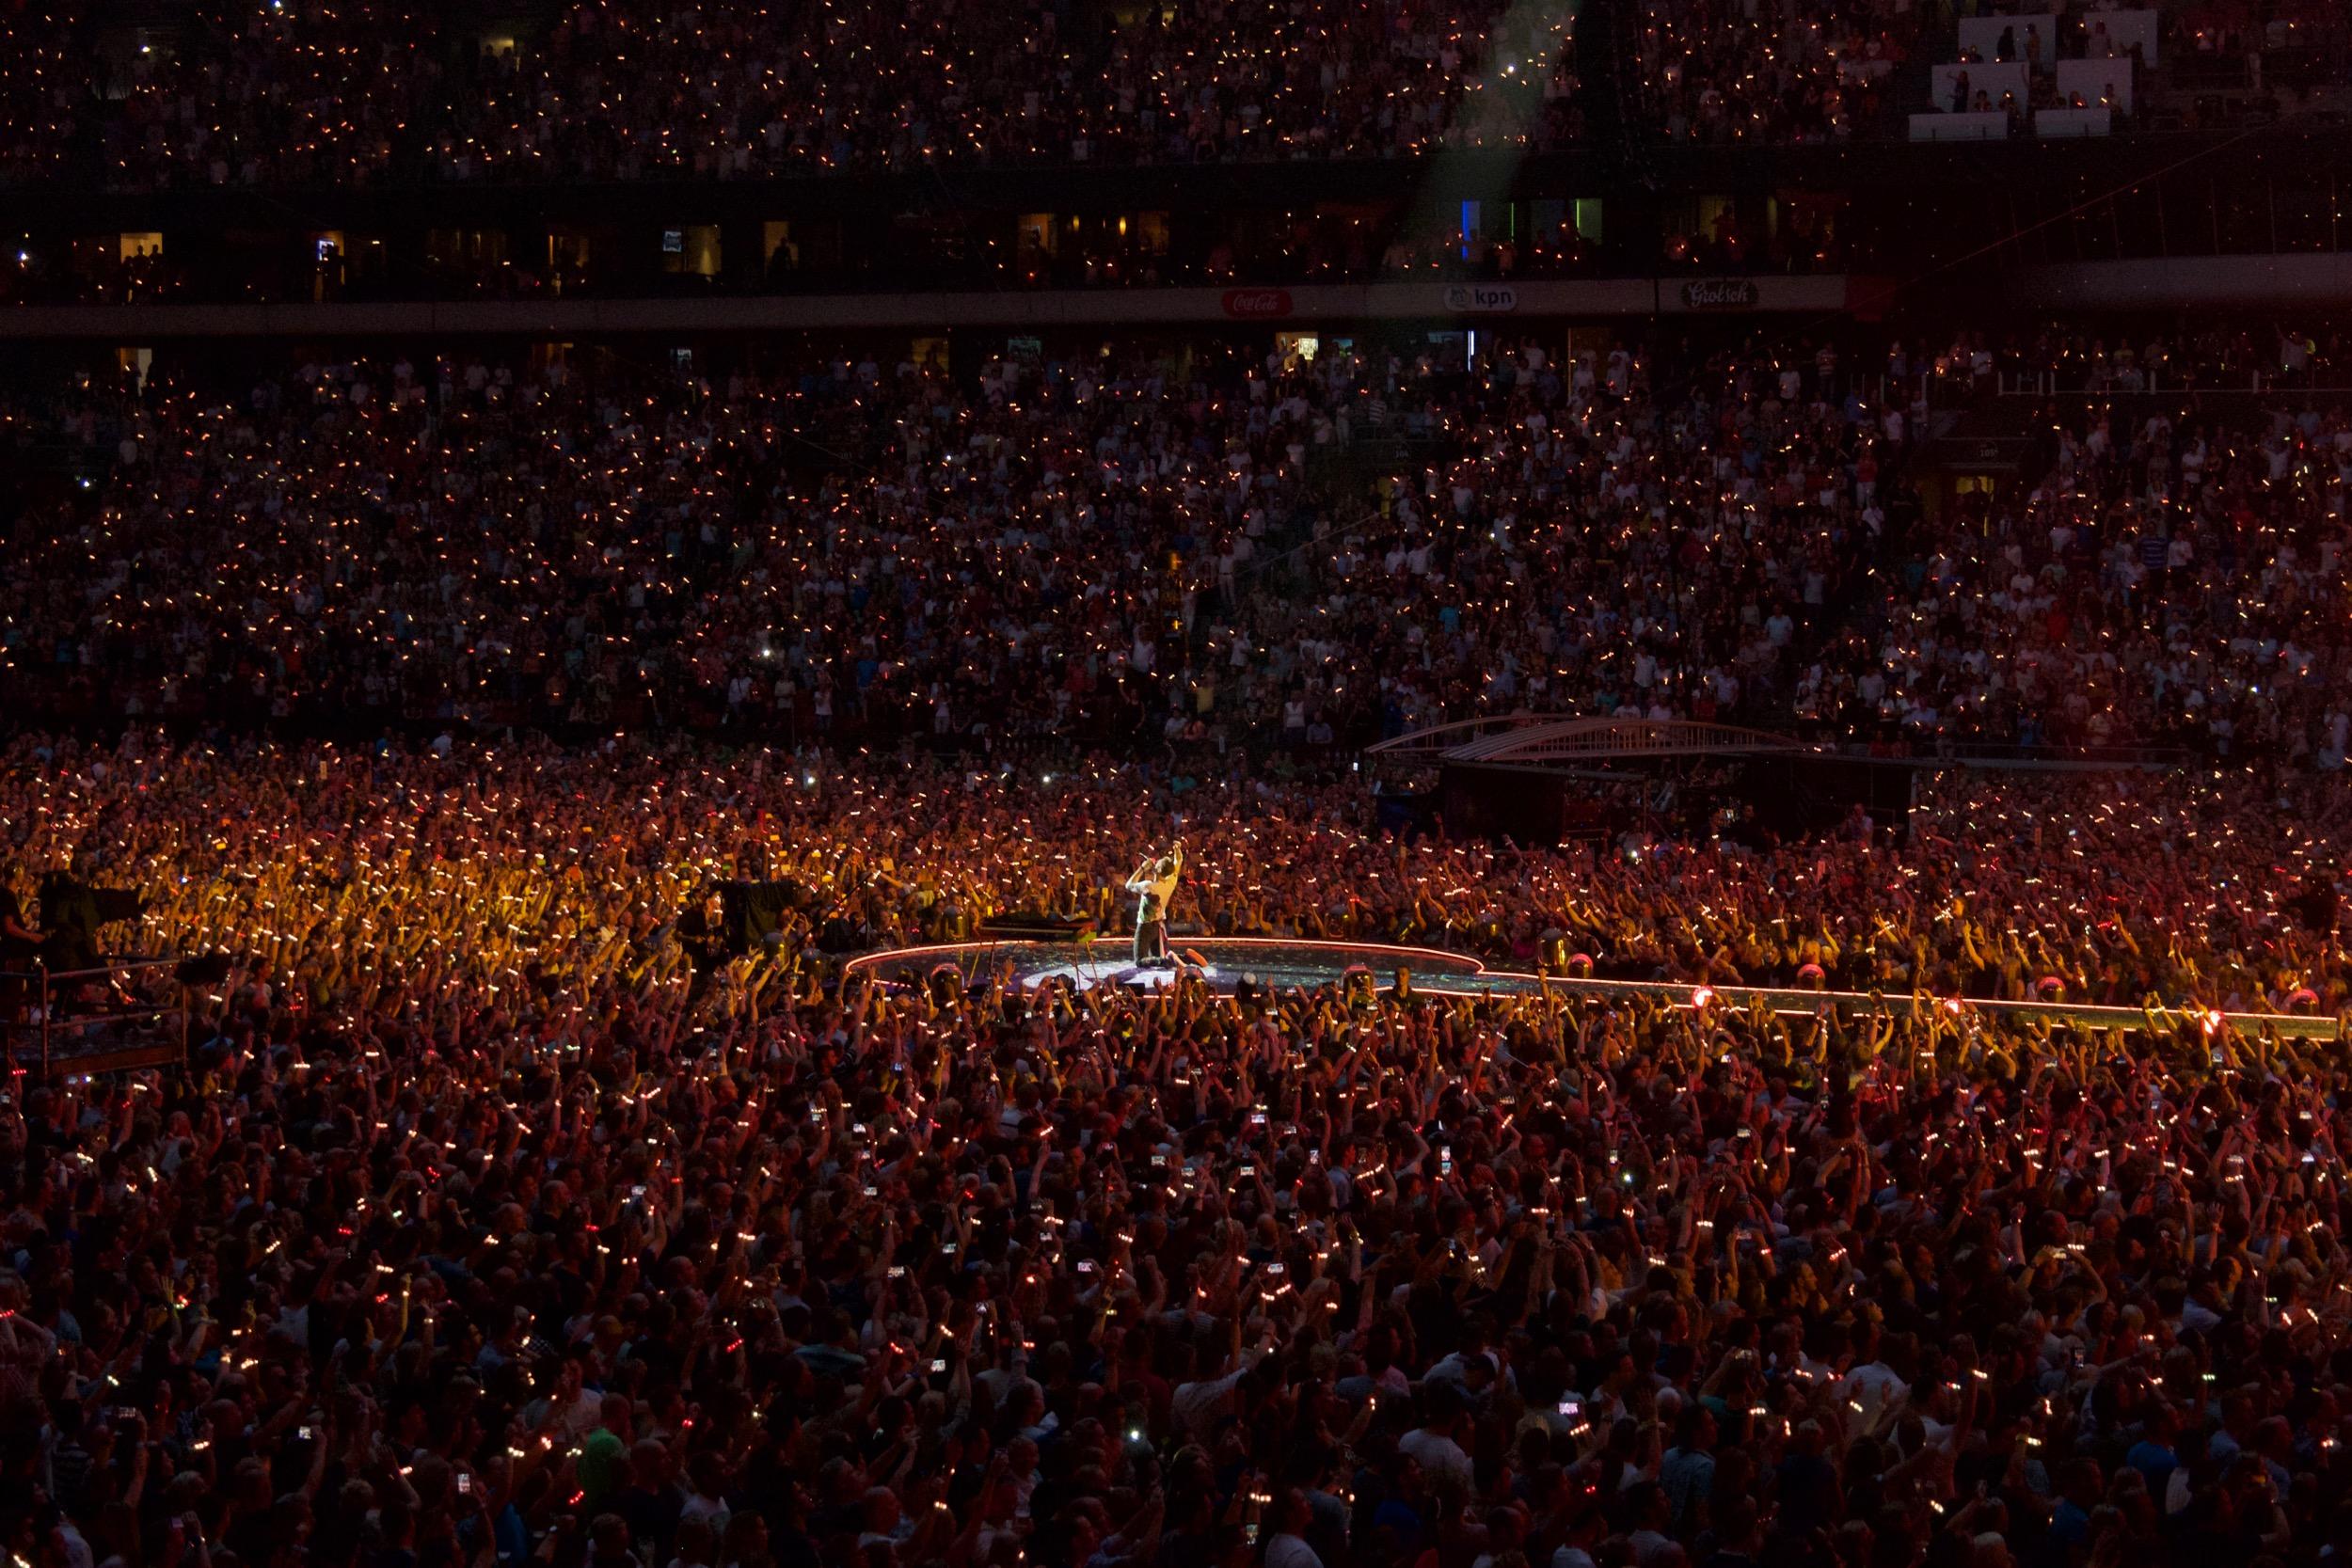 Coldplay_perform__Fix_You_,_Amsterdam_Arena,_June_2016_(3).jpg